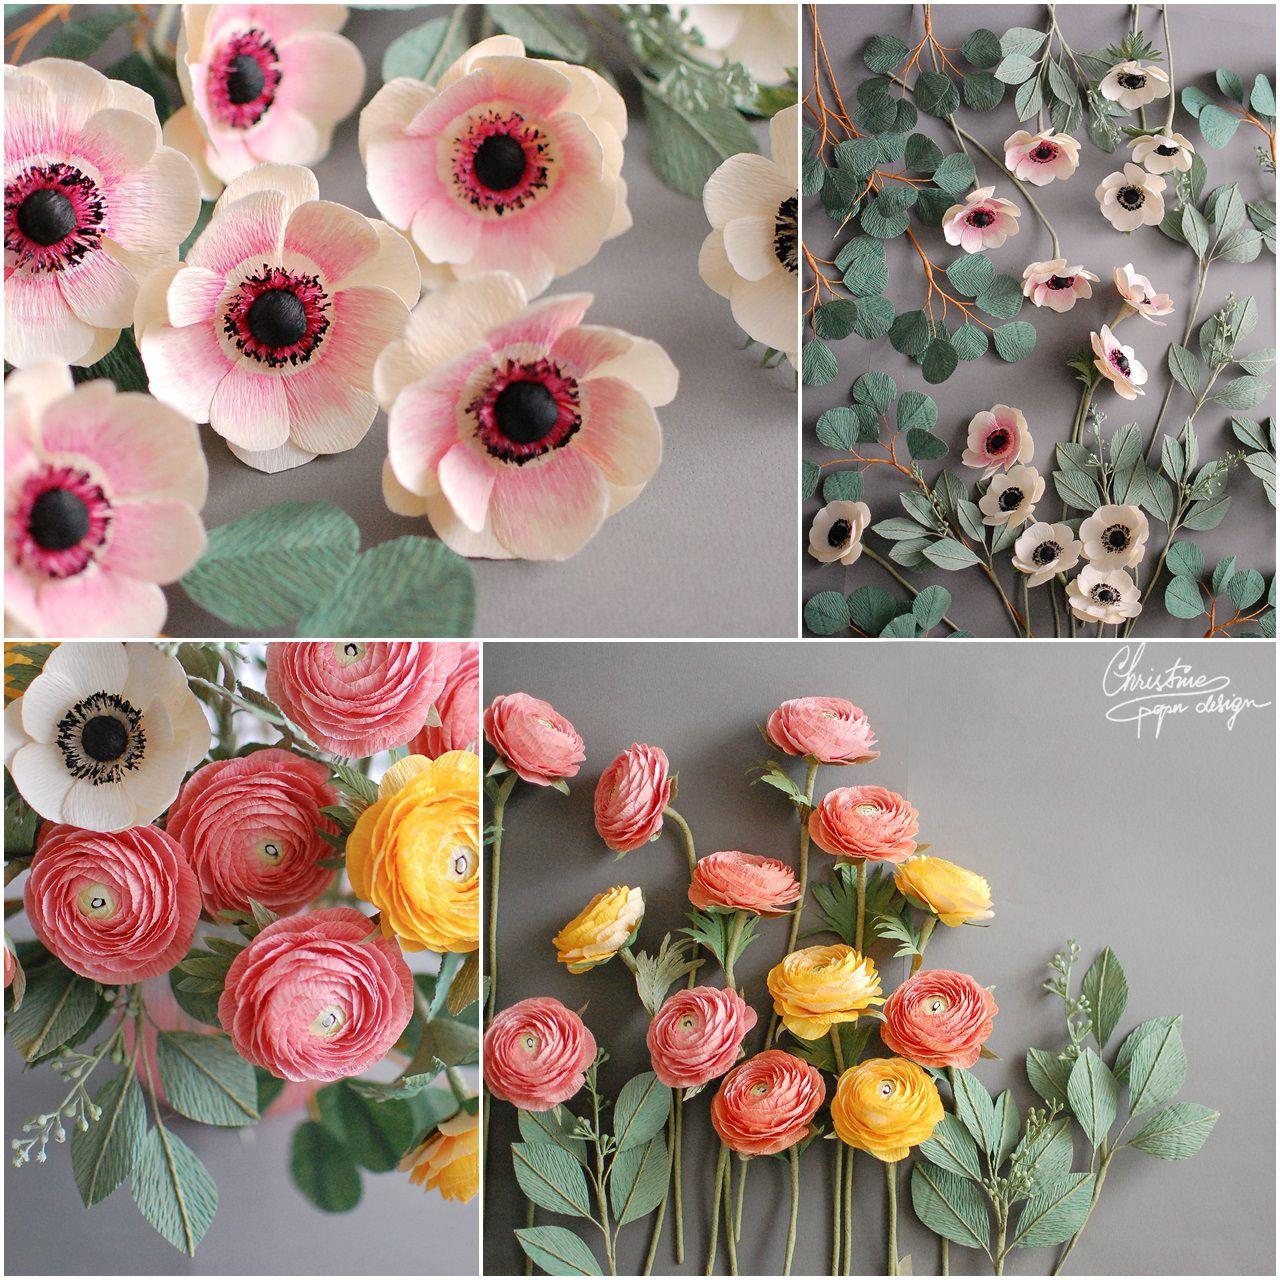 Christine Paper Design Paper Ranunculus And Anemone Crepe Paper